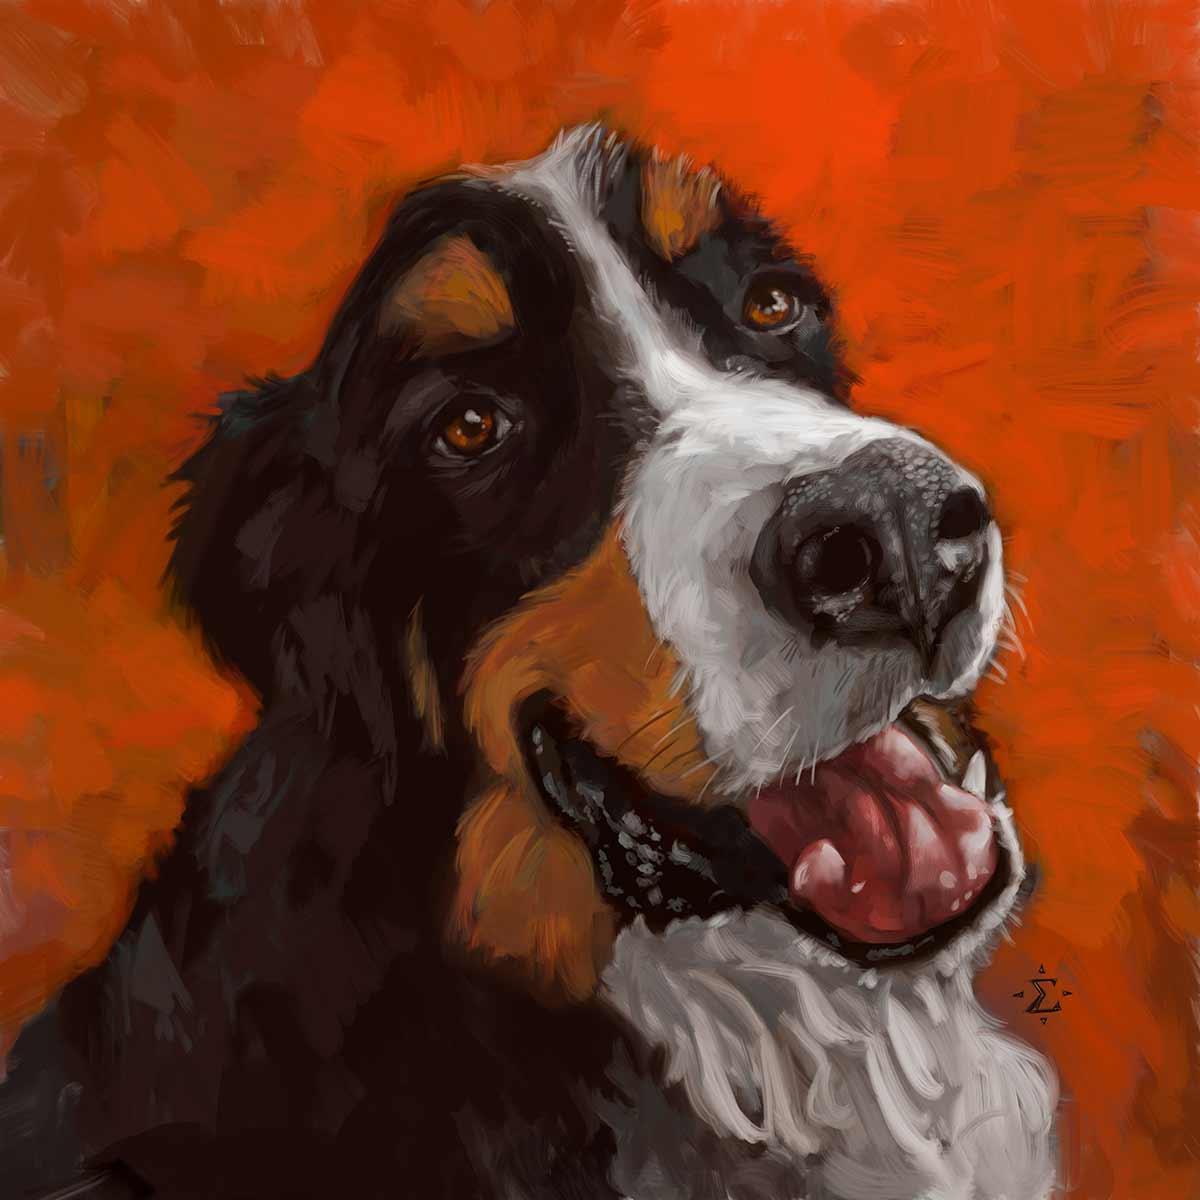 Smilin' Beorn portrait